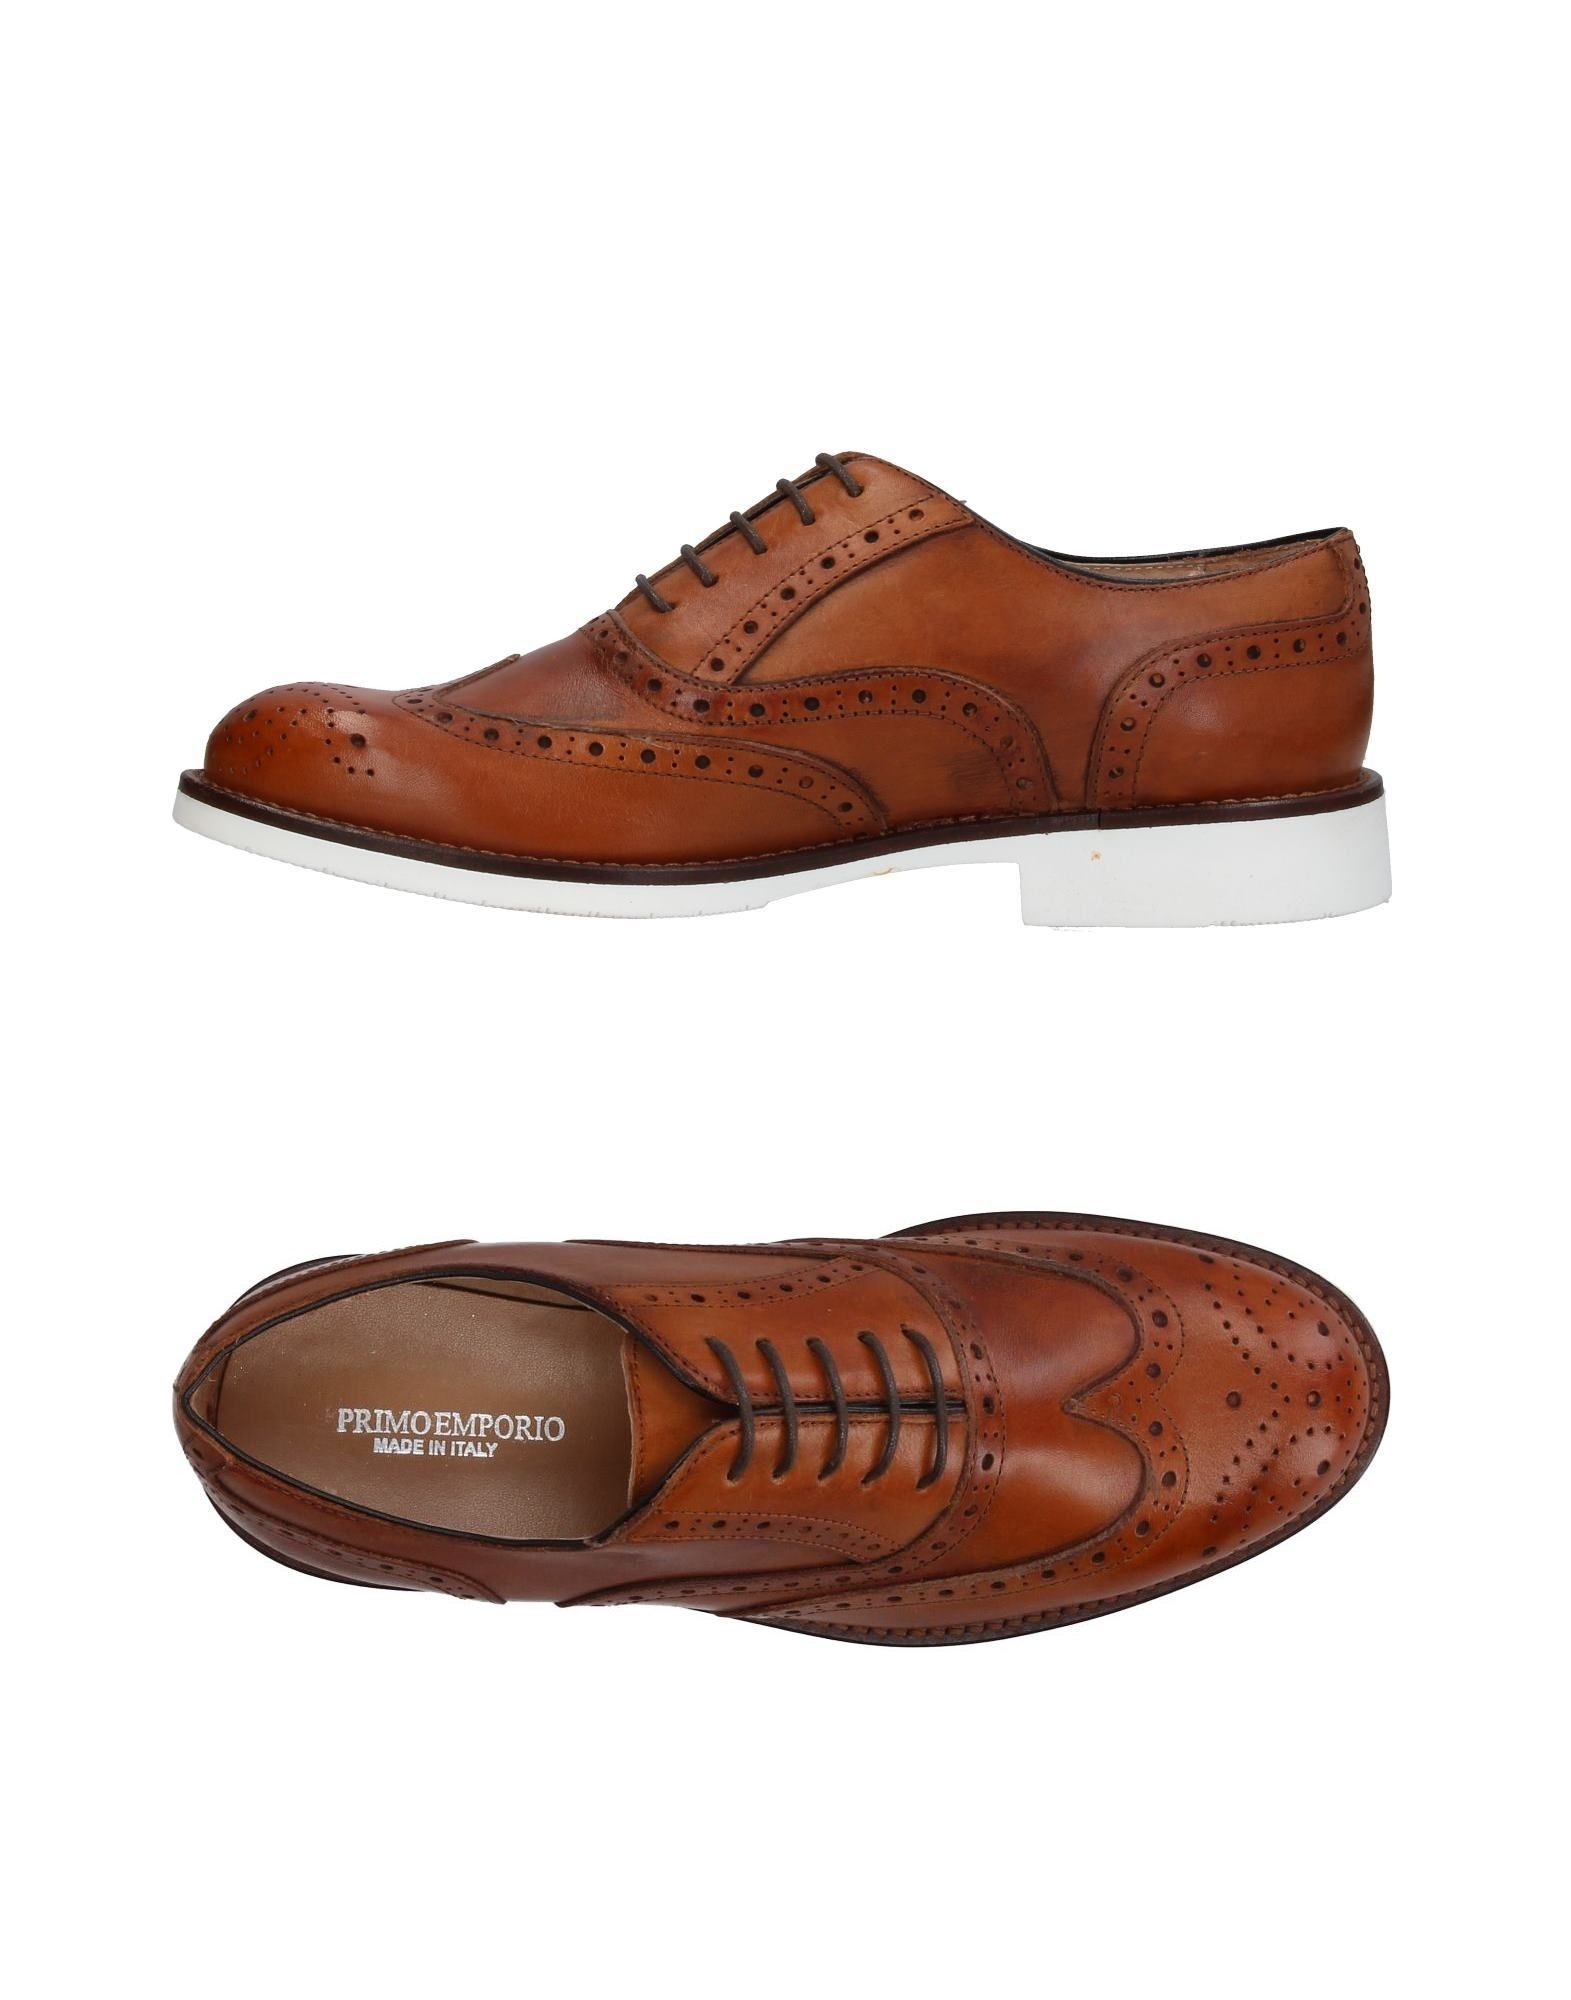 Rabatt echte Schuhe Primo Emporio Schnürschuhe Herren  11395471ML